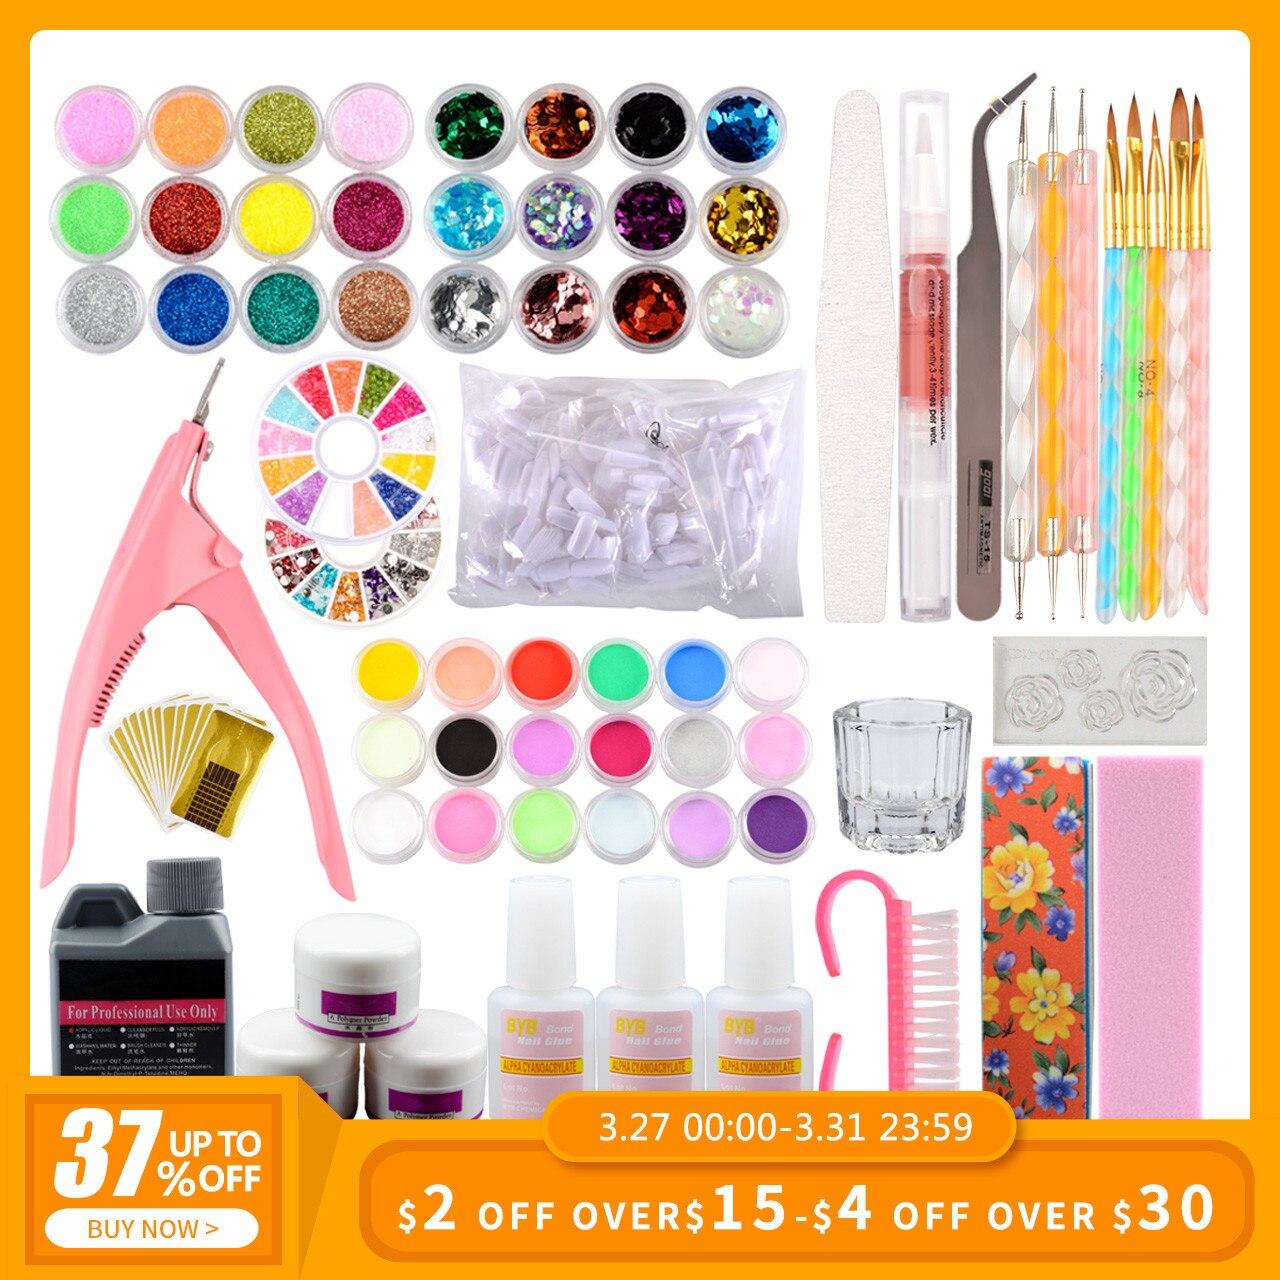 Manicure Acrylic Nail Set Acrylic Powder 3D Tips Glass Cup Nail Brush Crystal Polymer Manicure Tools Set Kit Nail Extension Kits